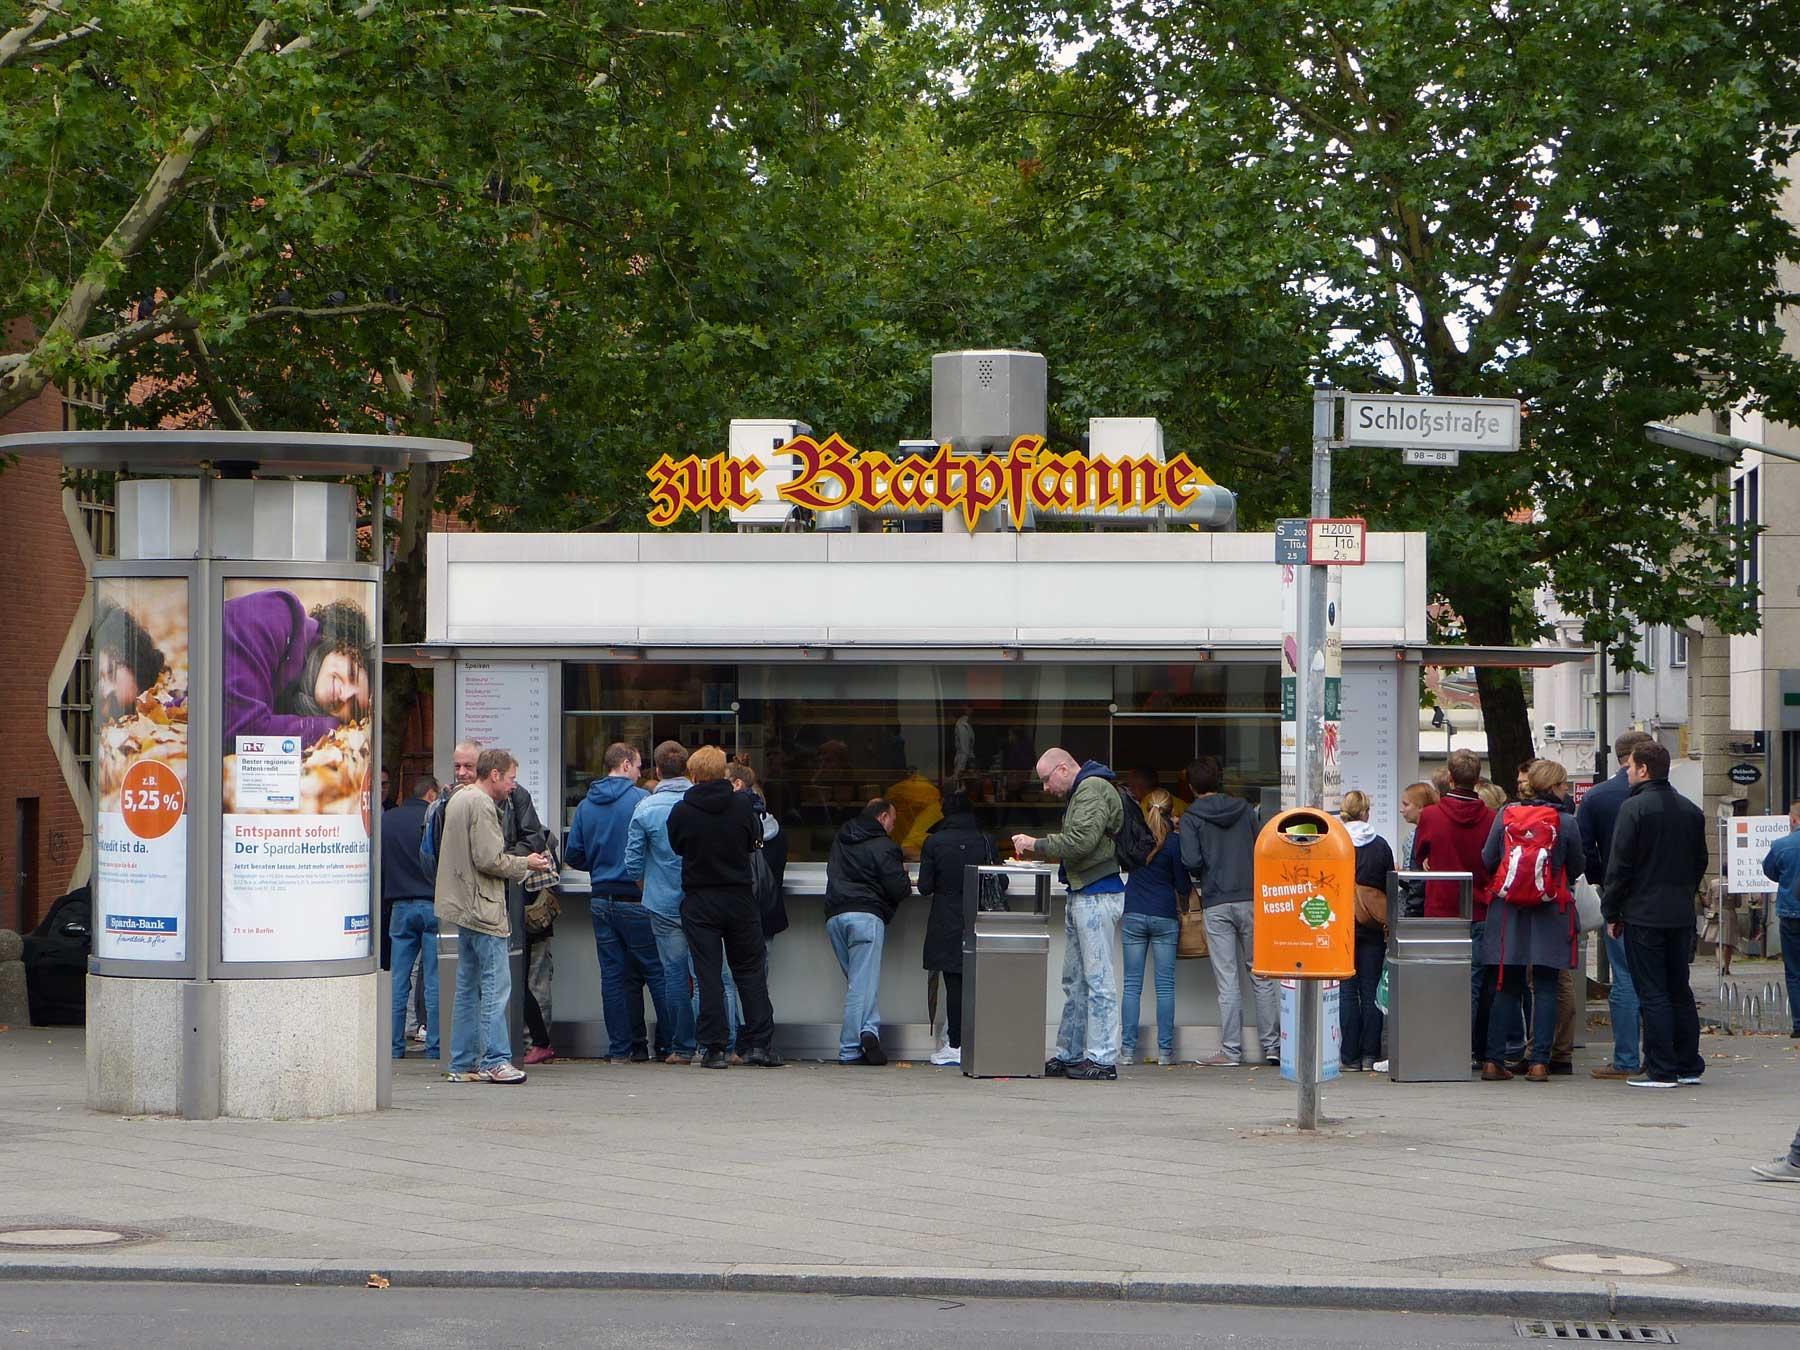 Currywurst stand, corner of Schloßstraße and Kieler Straße, Berlin